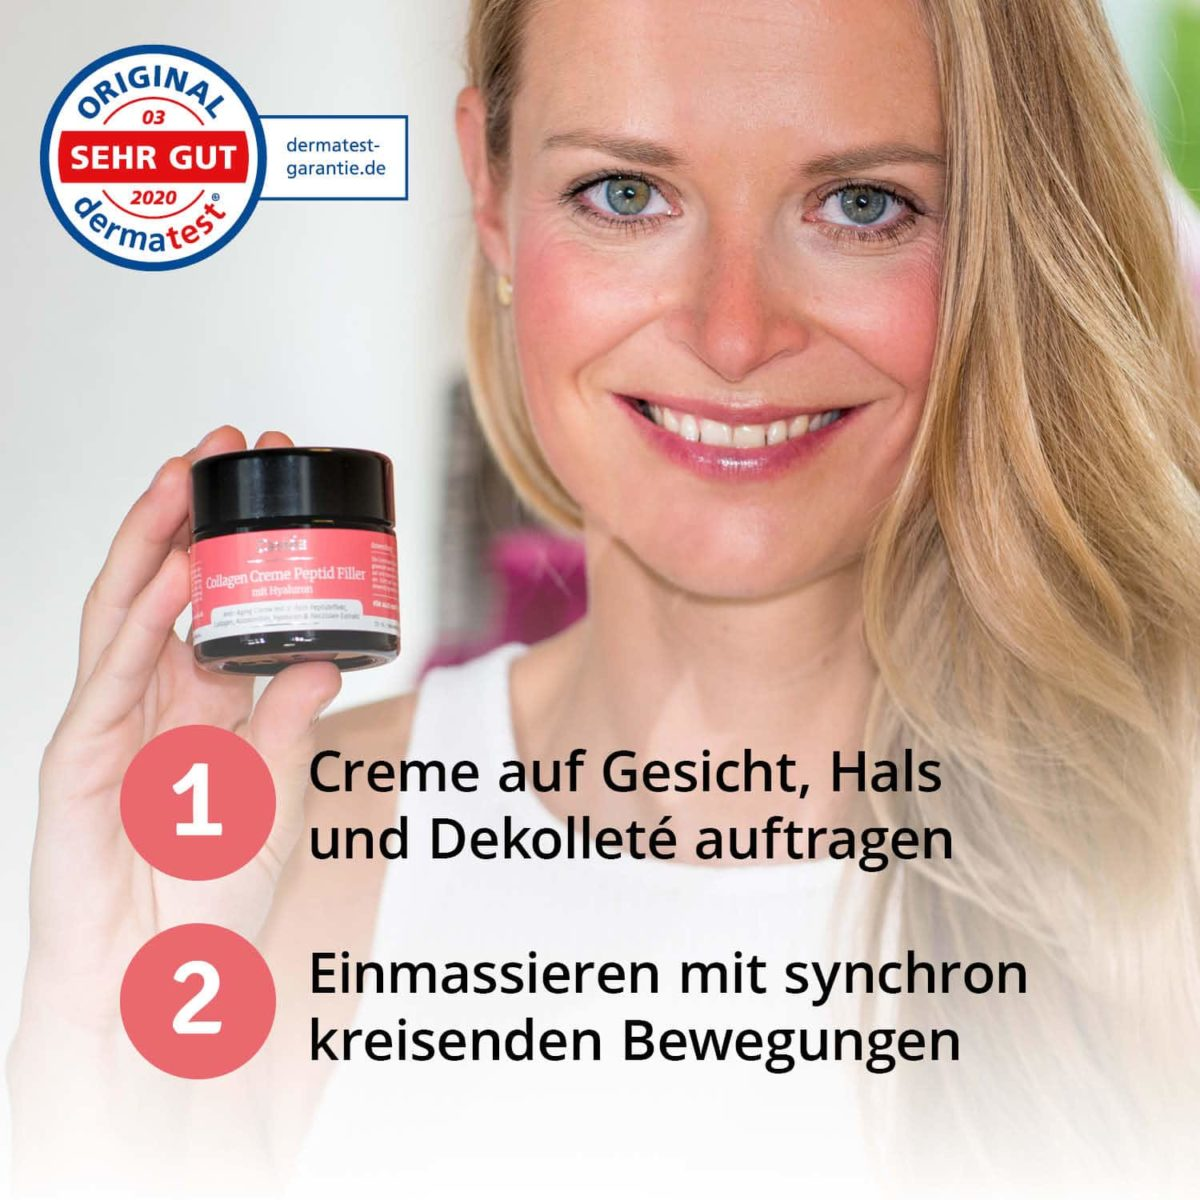 Casida Collagen Creme Peptid Filler + Hyaluron – 50 ml 15408250 PZN Apotheke Gesichtspflege6